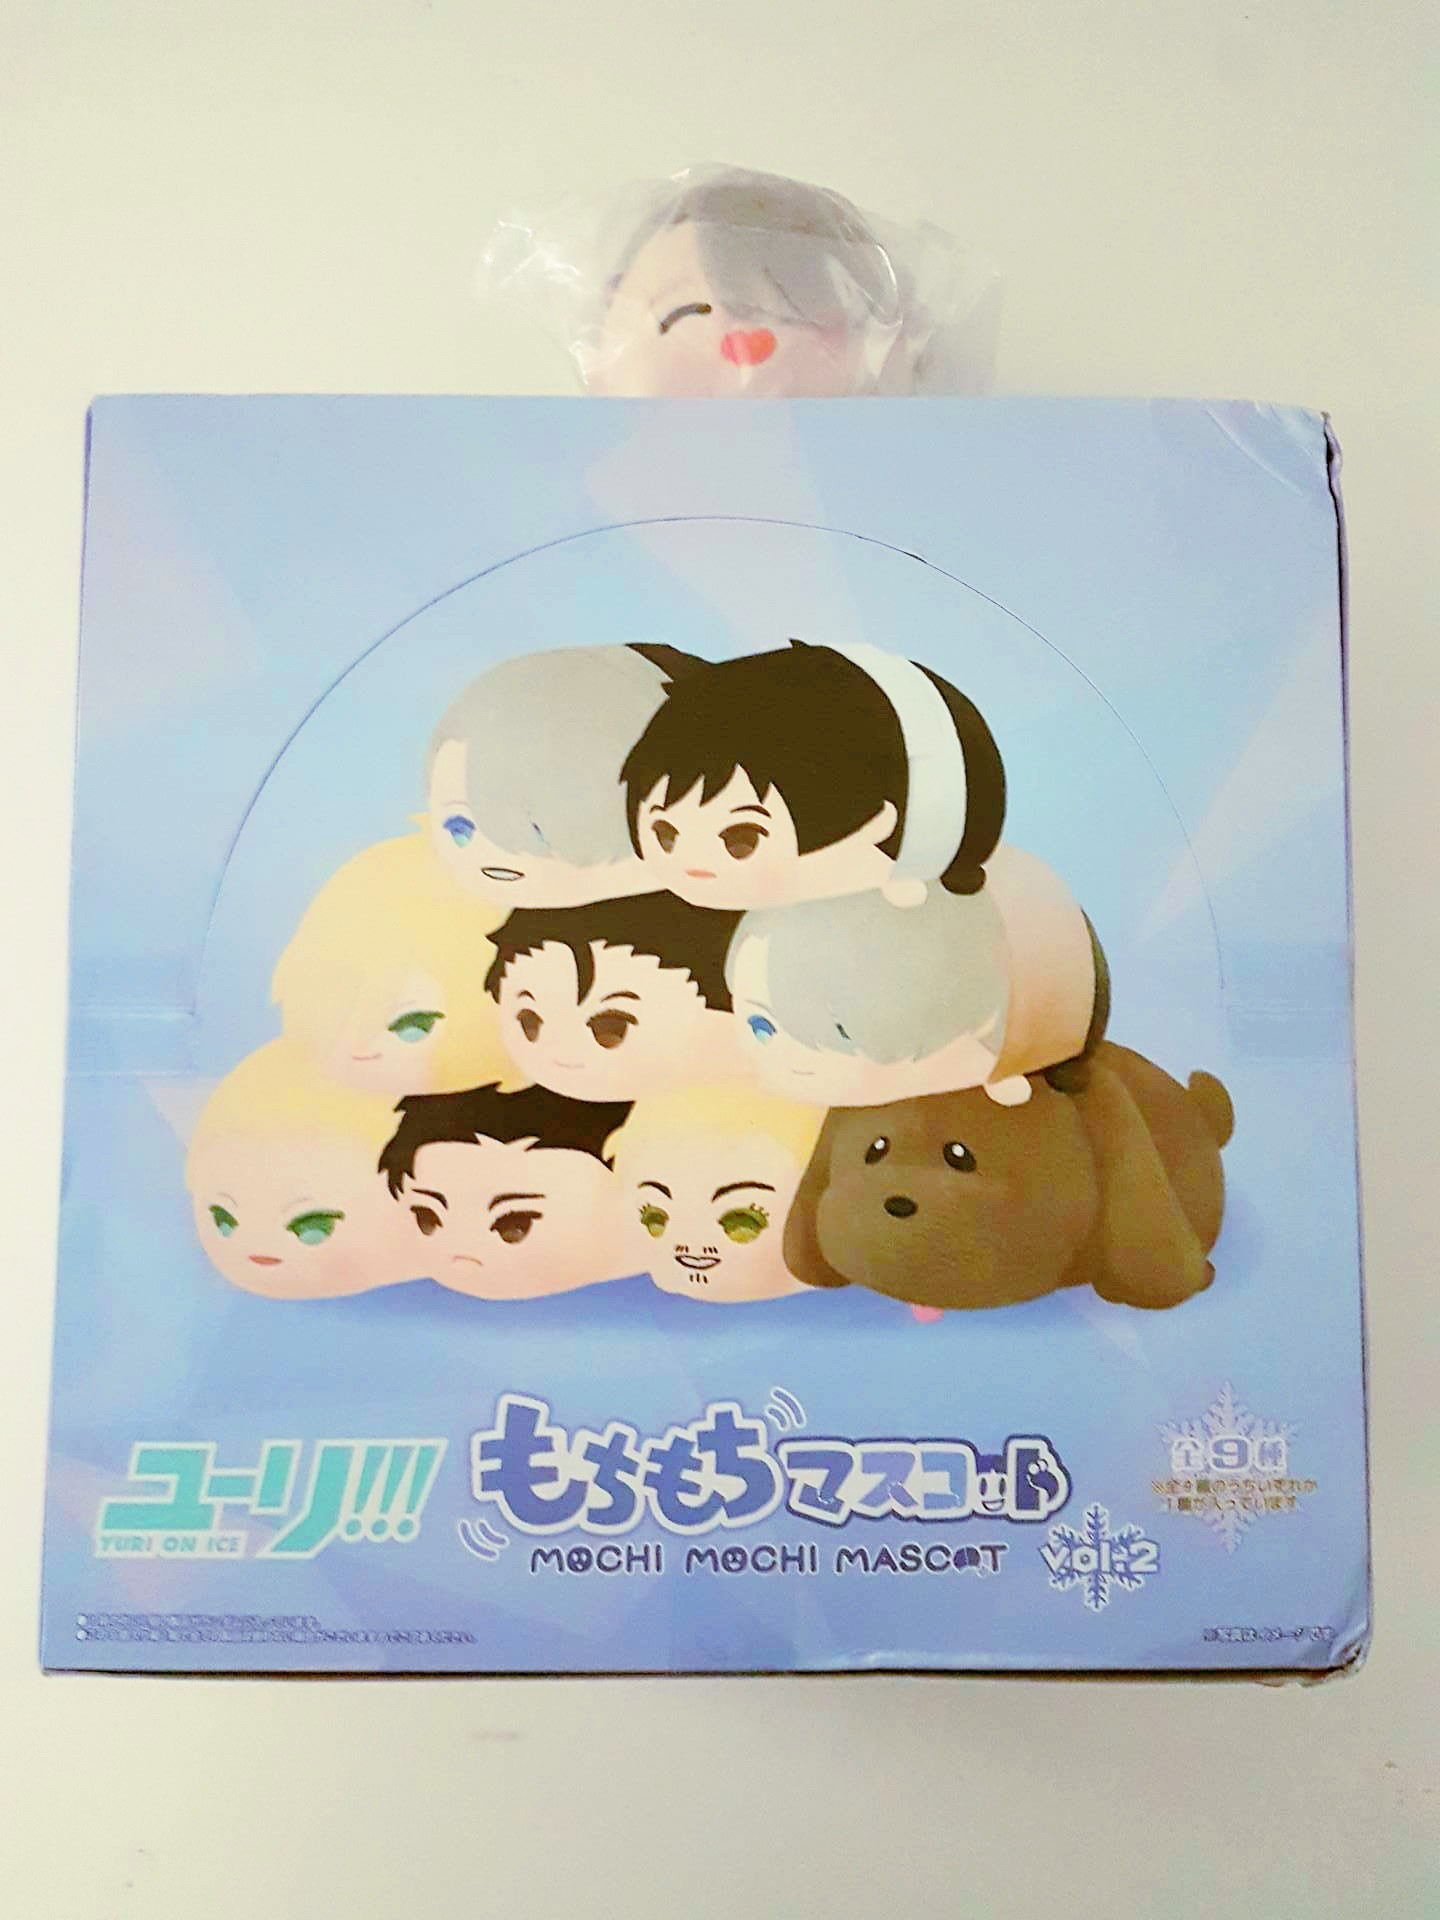 sk_japan mochi_mochi_mascot mappa makkachin yuri!!!_on_ice katsuki_yuuri yuri_plisetsky otabek_altin christophe_giacometti victor_nikiforov yuri!!!_on_ice_mochi_mochi_mascot_vol.2